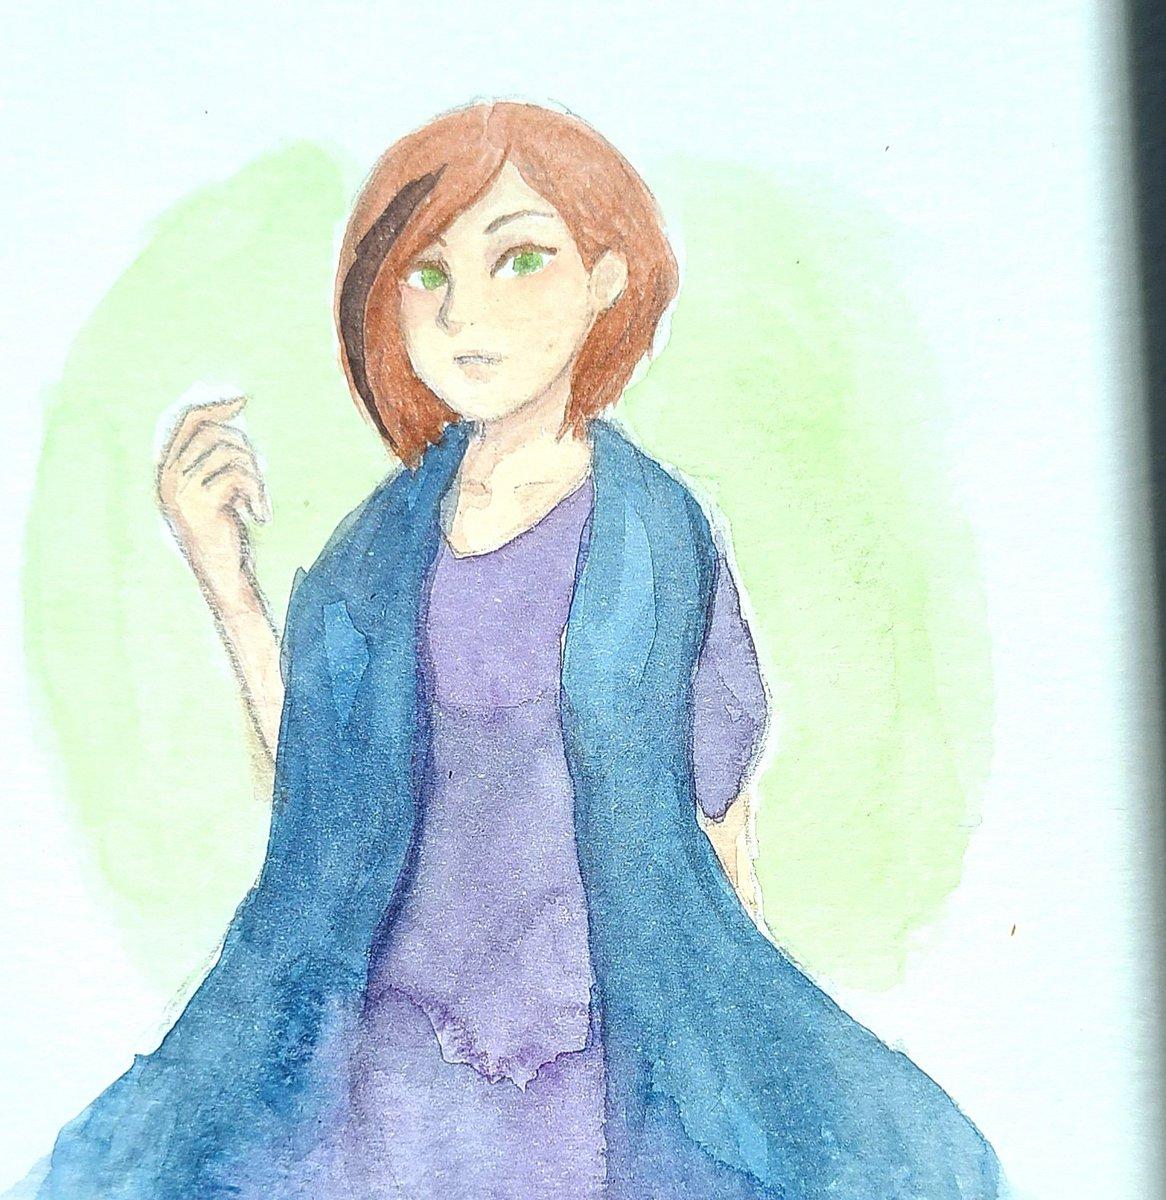 Morning #watercolor #Warmup   Aka I just want to paint more Ellie 😅  #watercolour #watercolorart #art #sketchbook https://t.co/iutat8bEcn